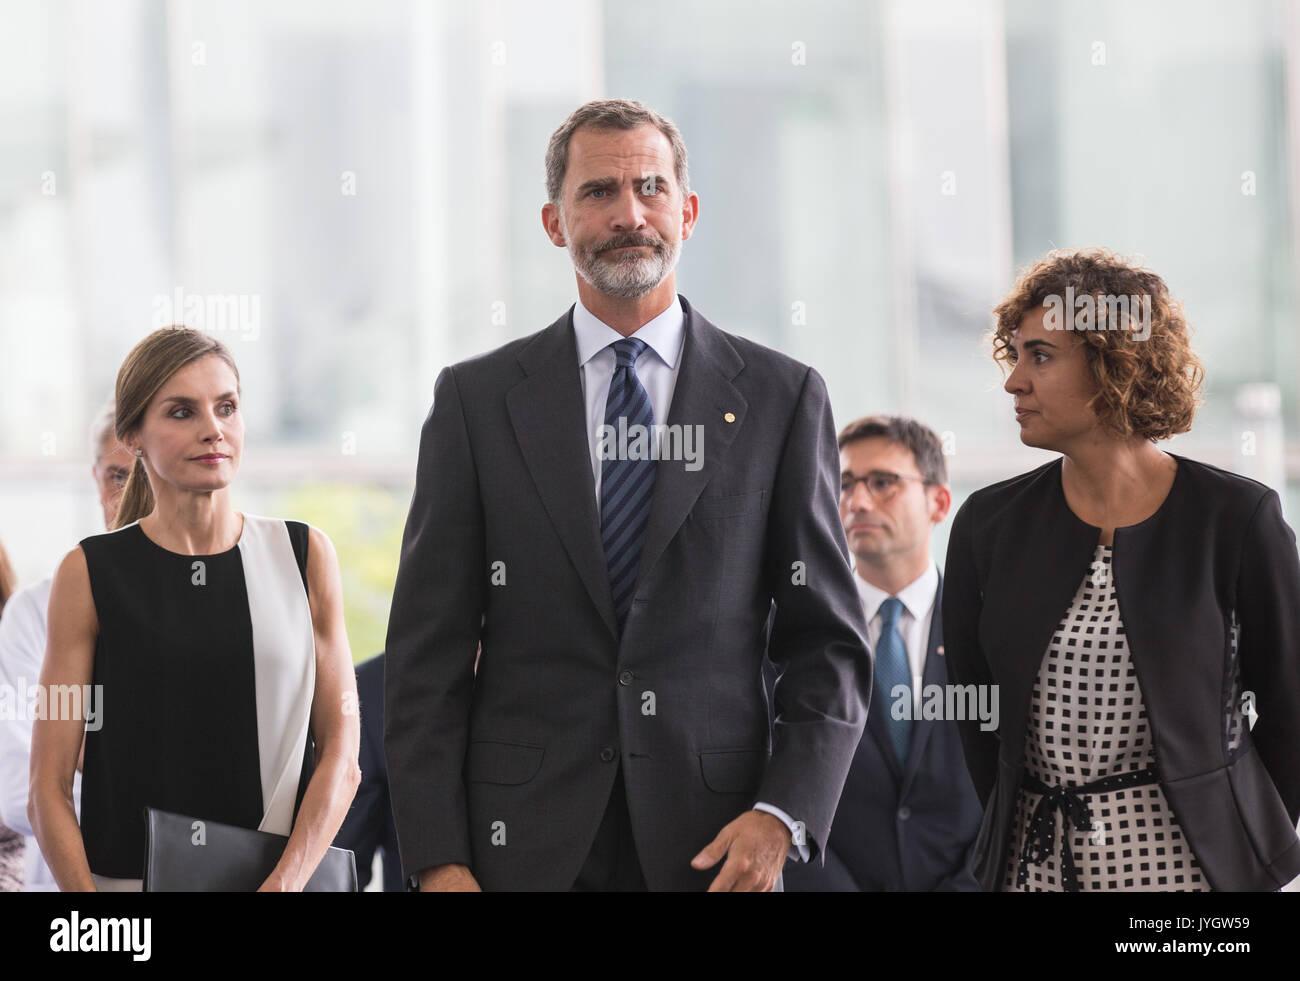 Barcelona, Spanien. 19 Aug, 2017. Spaniens König Felipe VI (C) und die Königin Letizia (Vorne L) Ankunft im Hospital Stockfoto